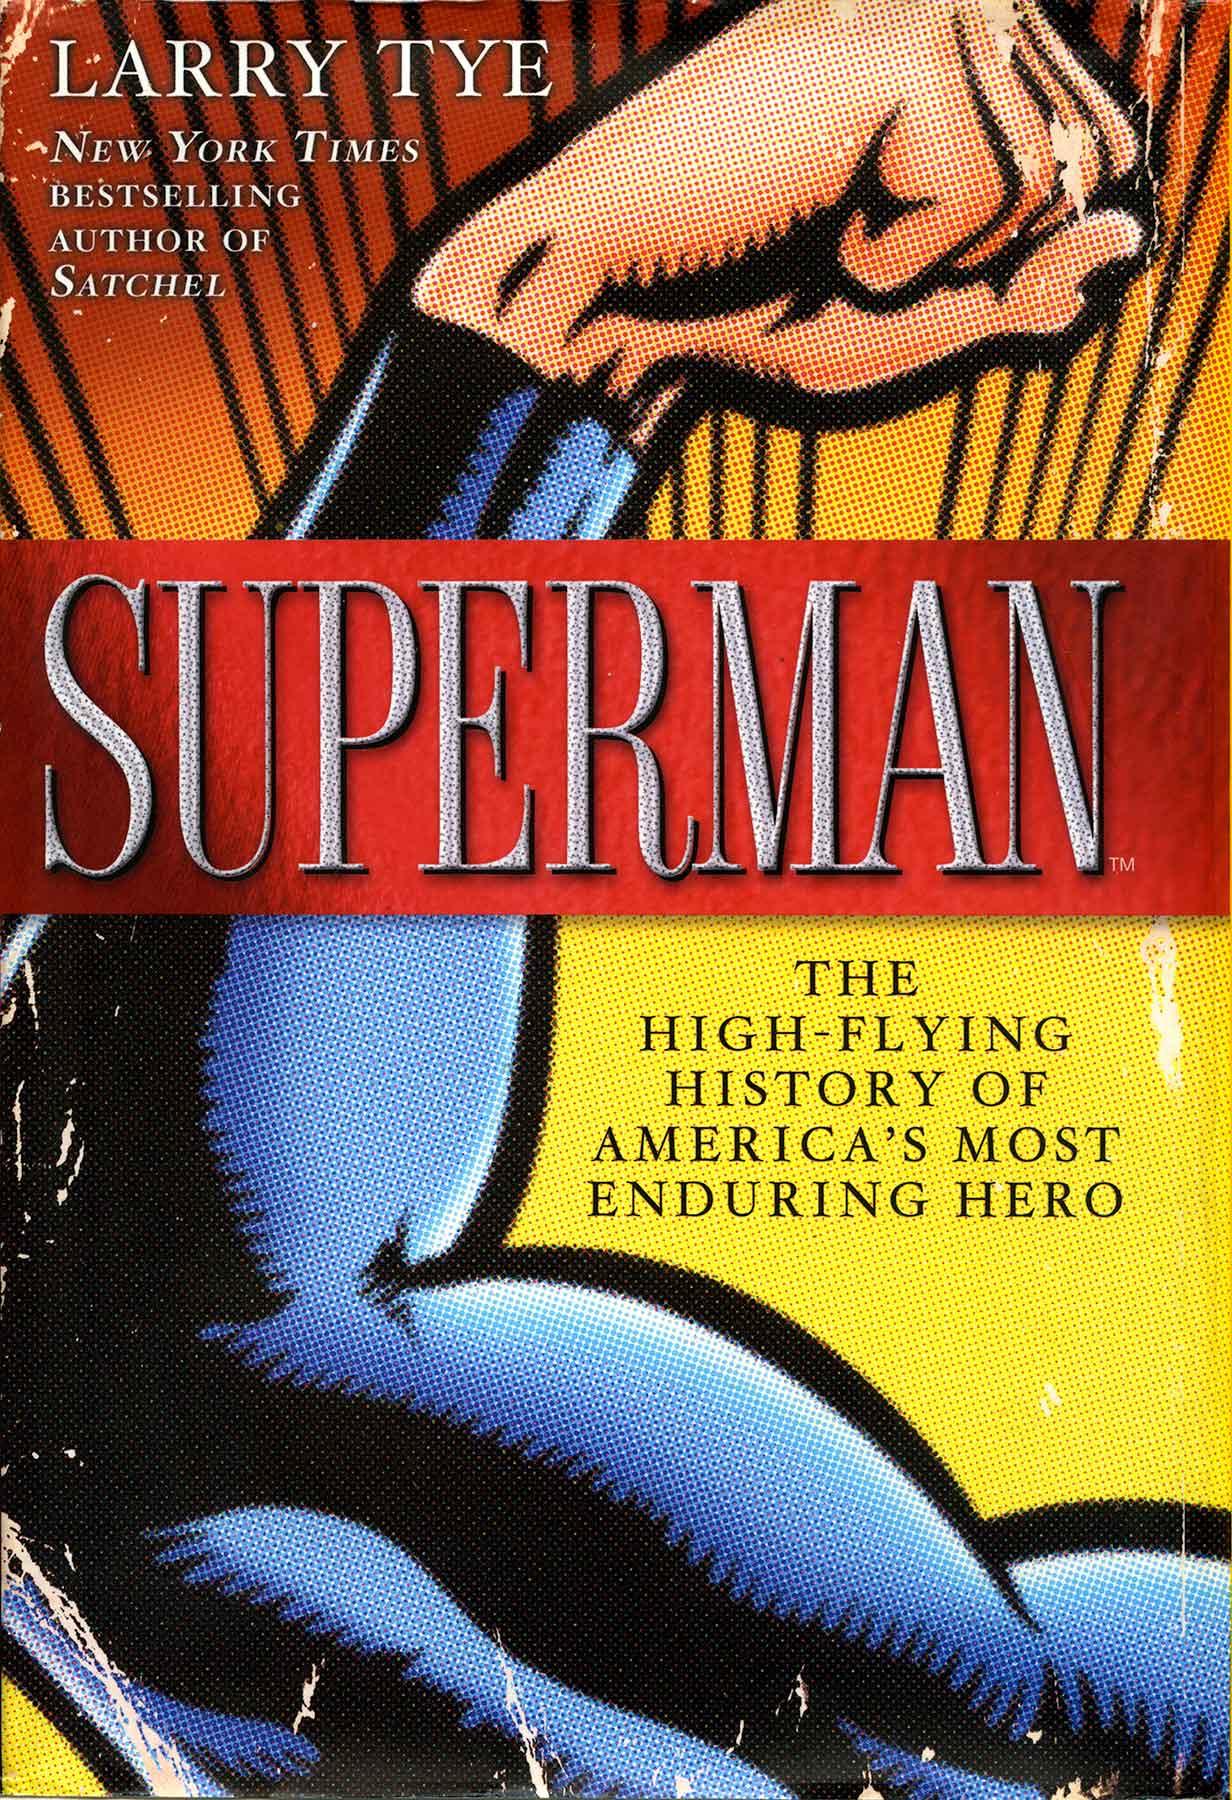 Arlen Schumer / Superman / Book Cover / Stock Illustration